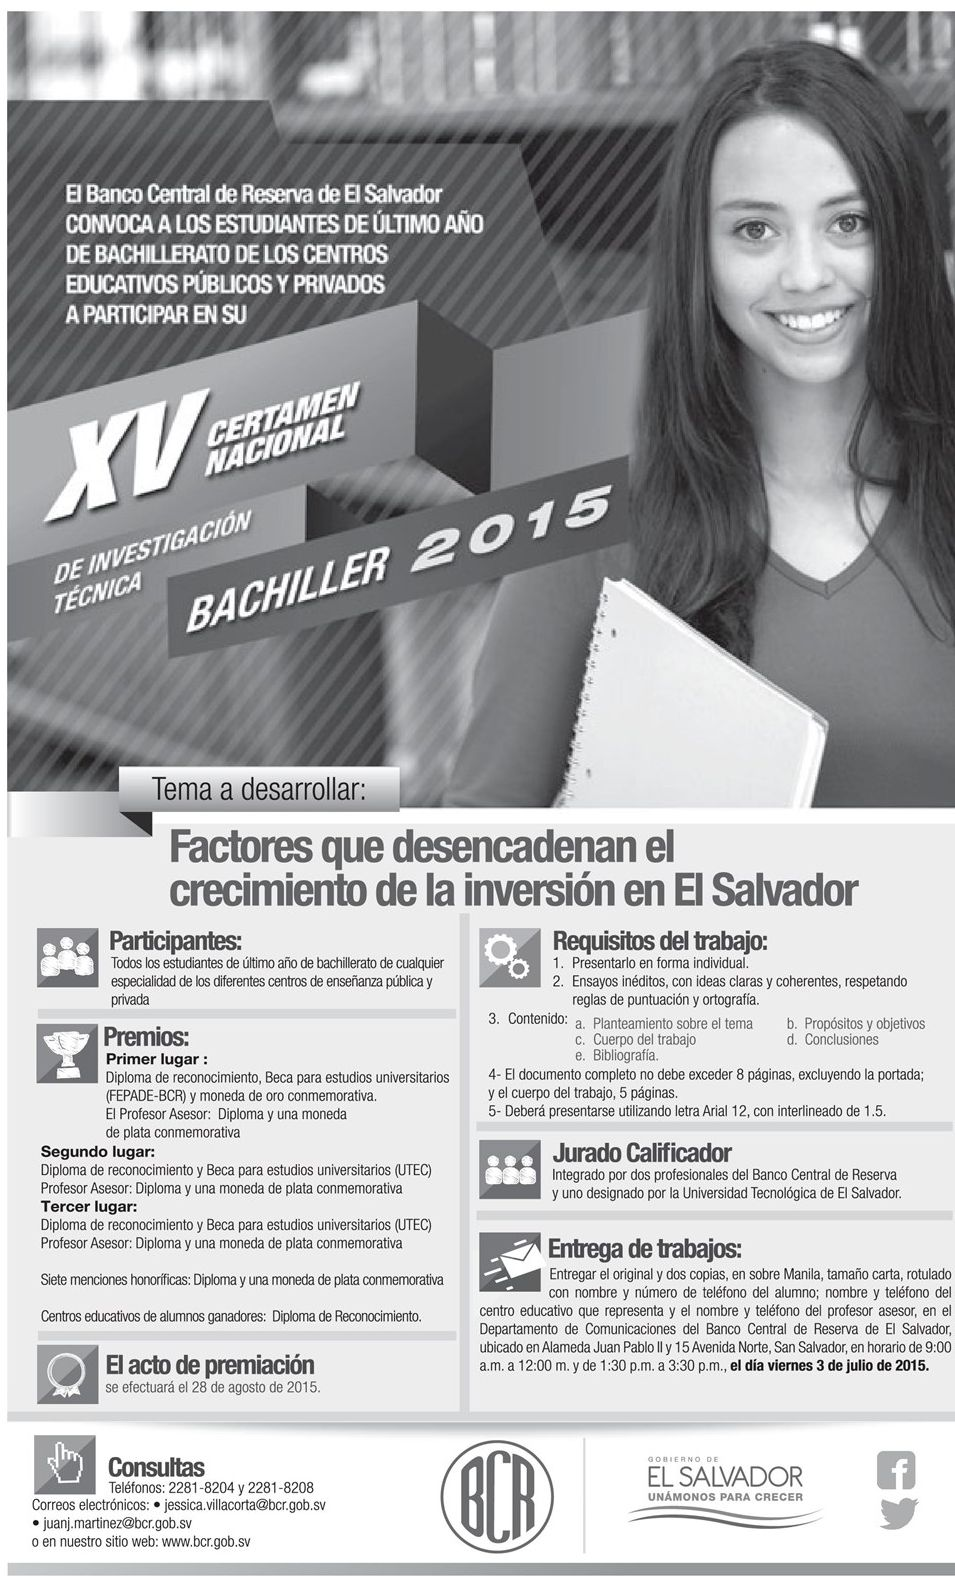 Certamen nacional de investigacion tecnica 2015 gracias a BCR el salvador